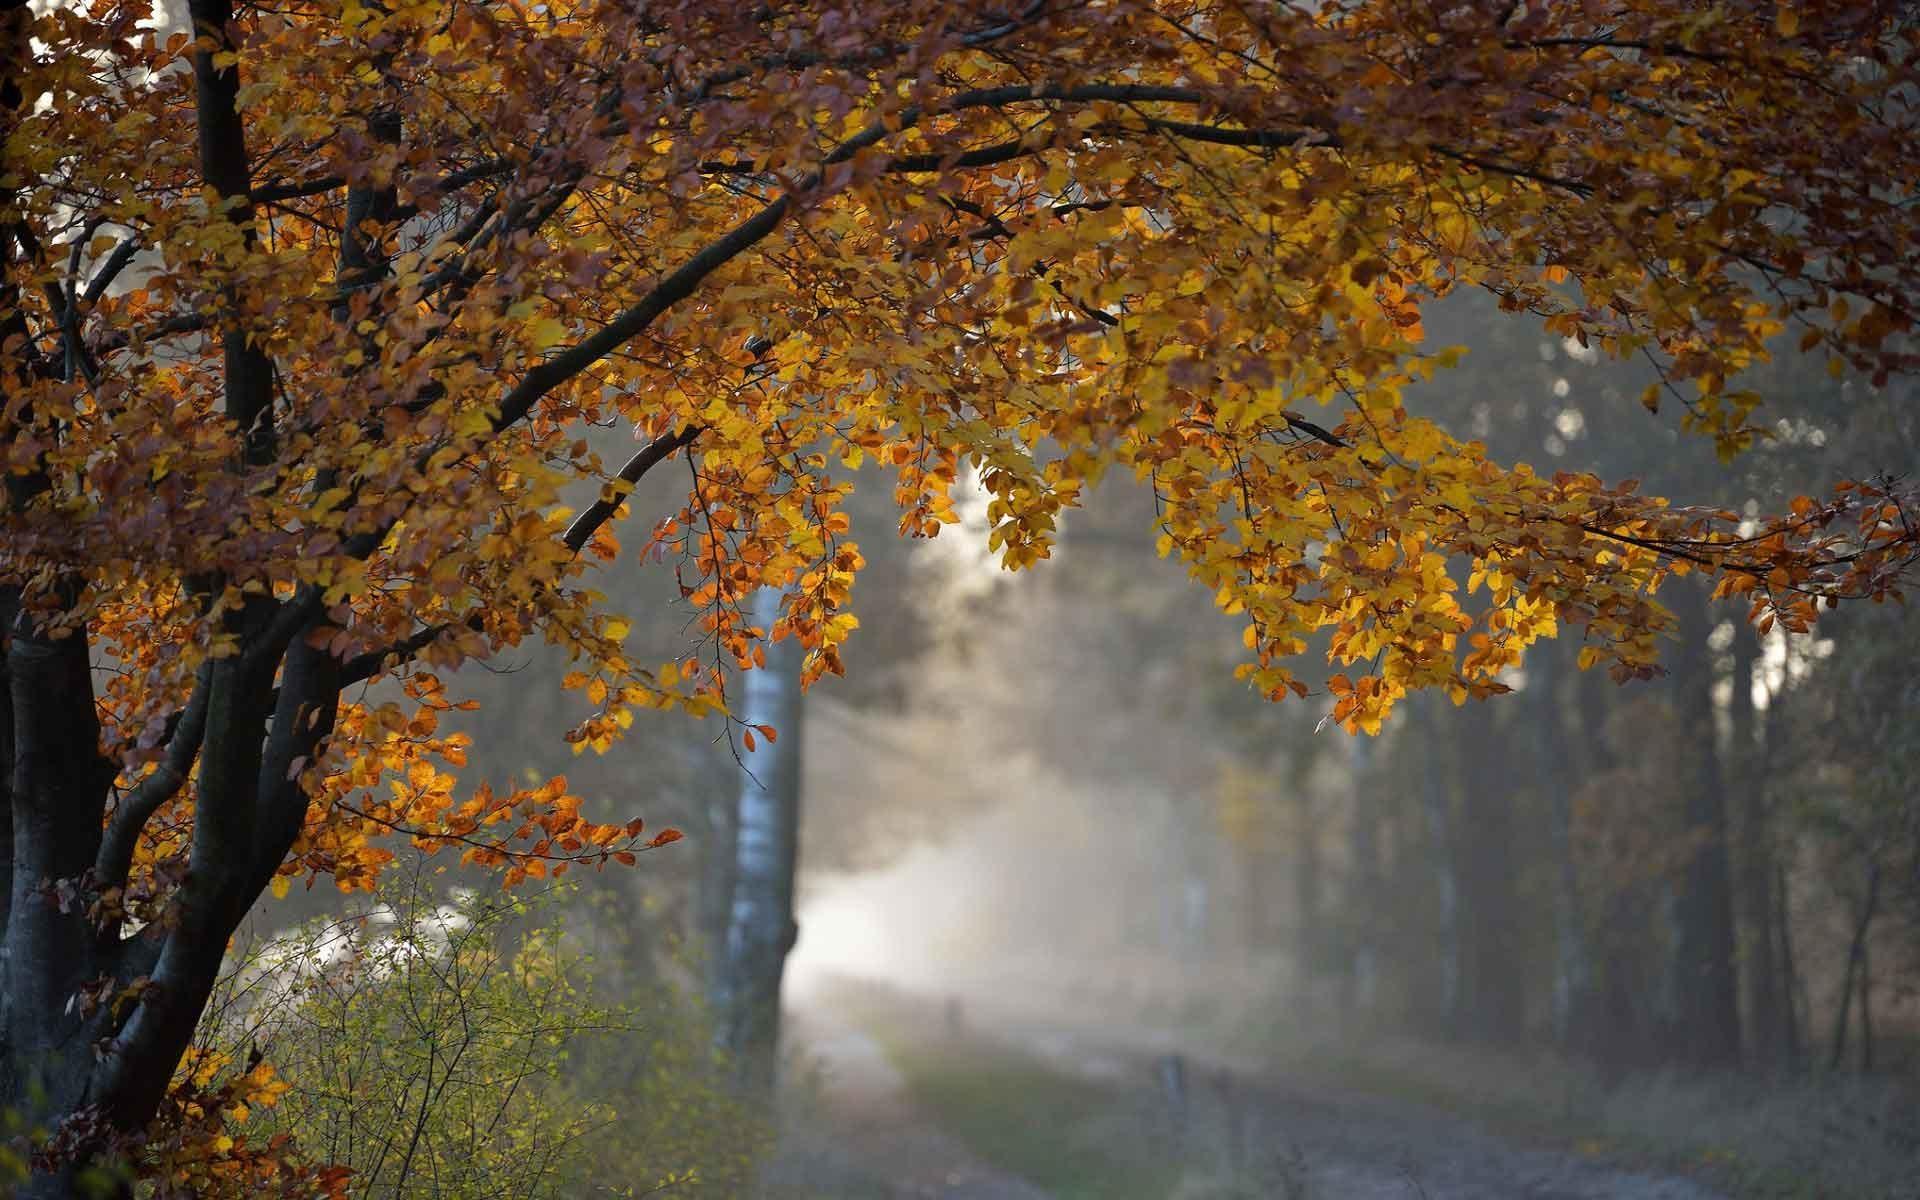 Wallpaper Images Of Fall Trees Lined Lake Nature Rain Wallpaper 183 ① Wallpapertag